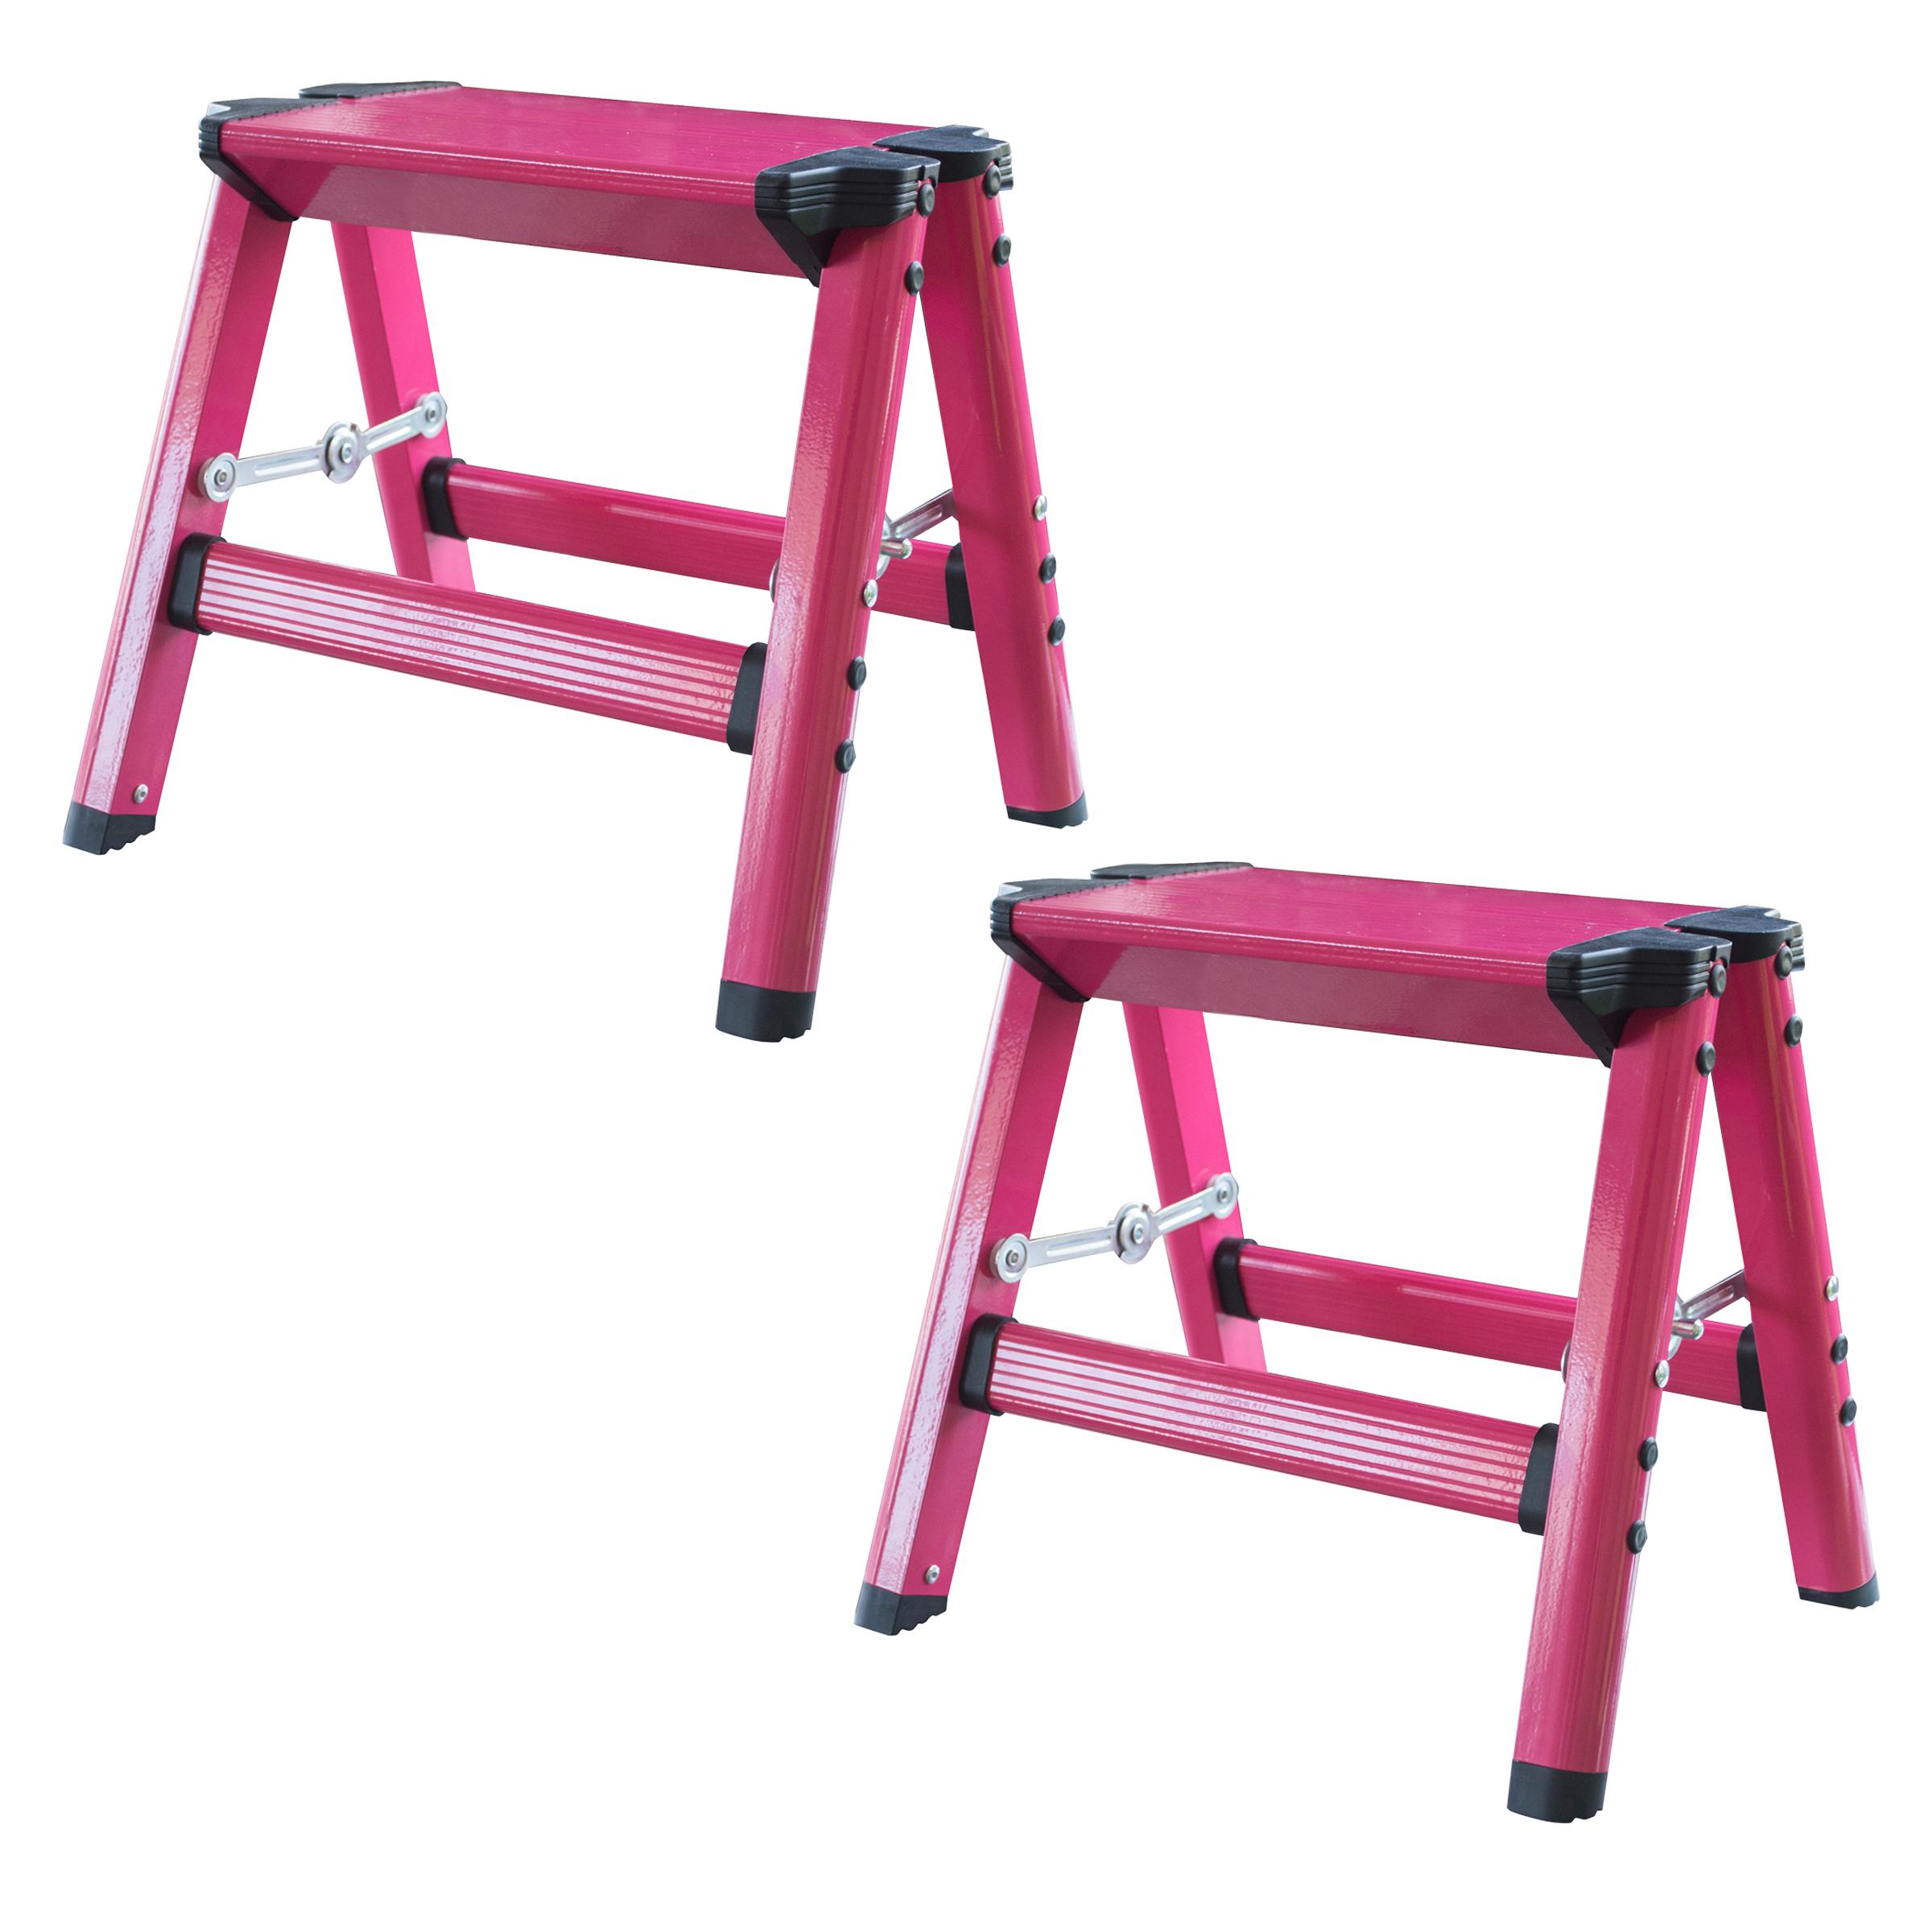 AmeriHome Lightweight Single Step Aluminum Step Stool 2 Piece Set - Bright Pink